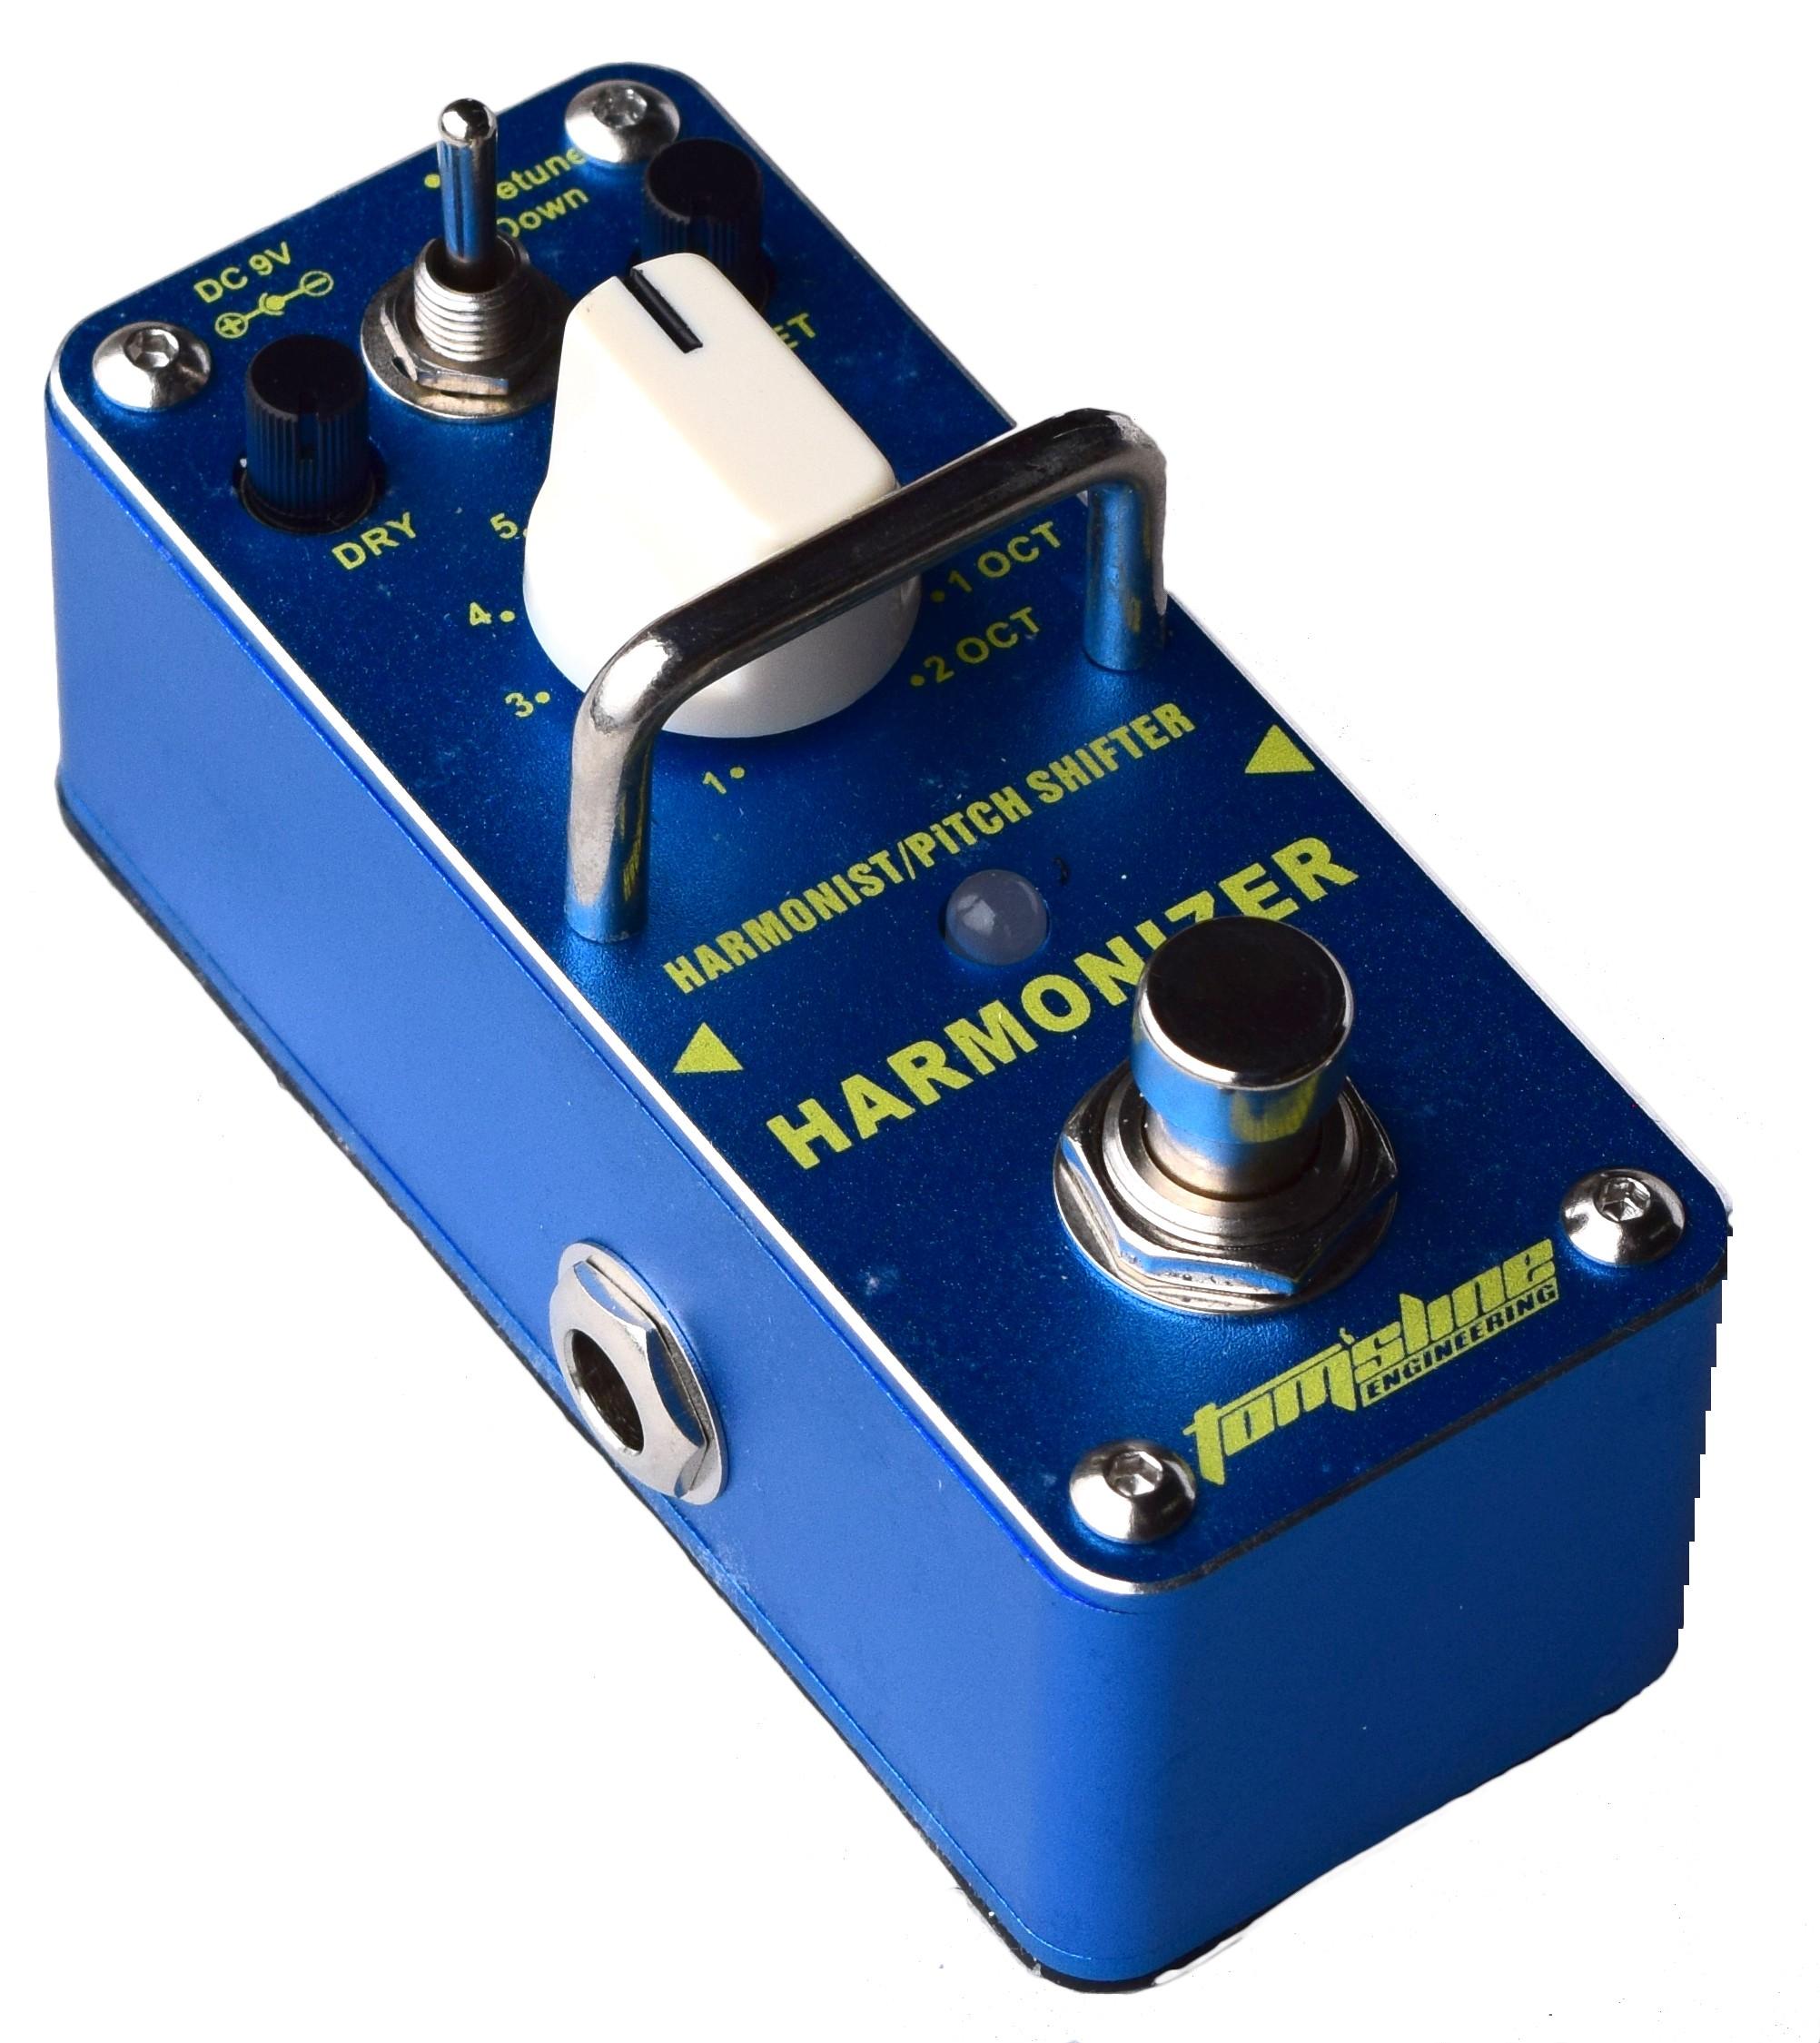 TOMSLINE AHAR3 HARMONIZER - HARMONIST/PITCH SHIFTER PEDAL